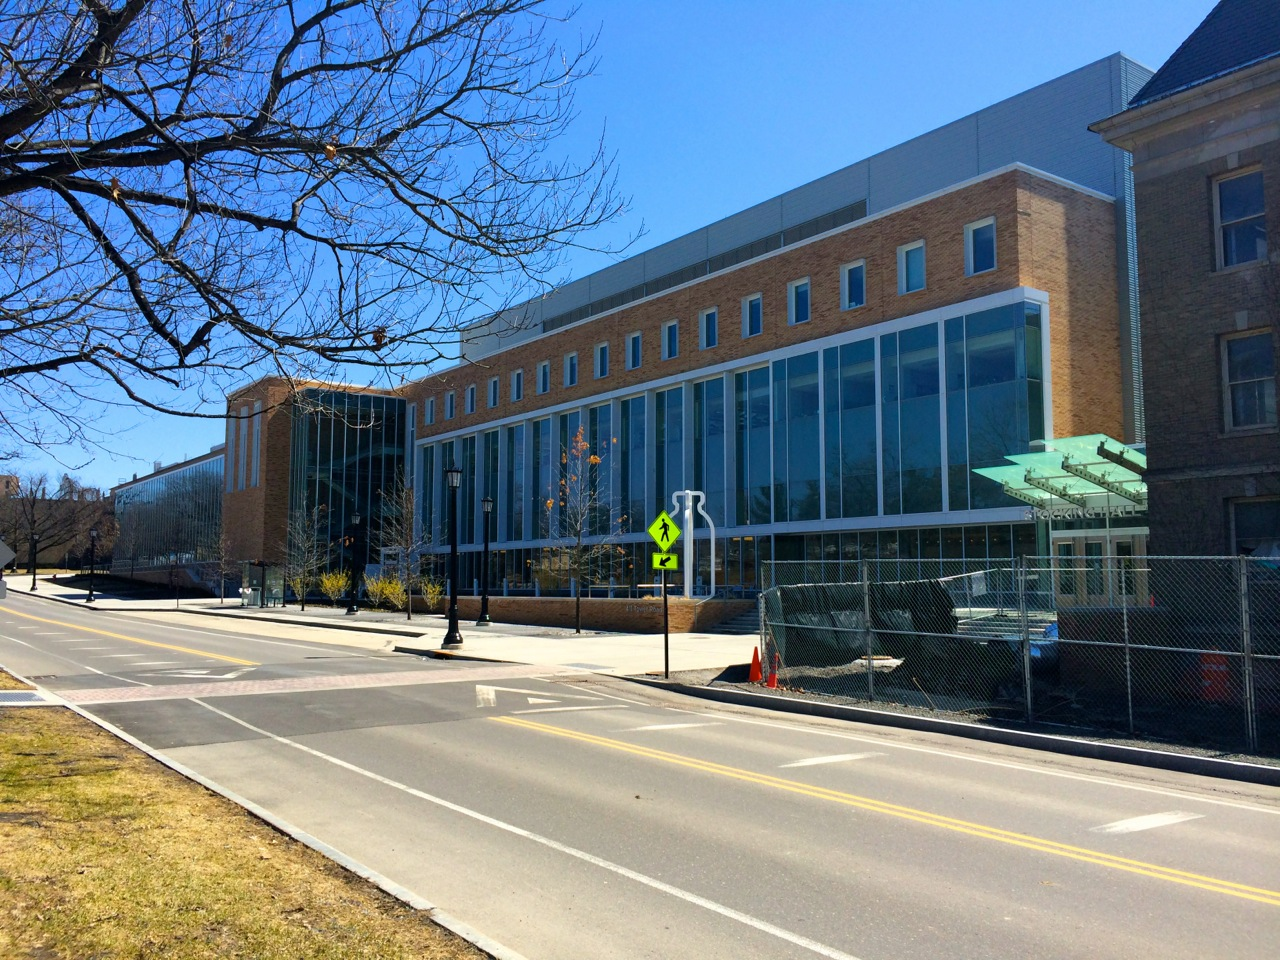 Stocking-Hall-Cornell-Ithaca-04061407